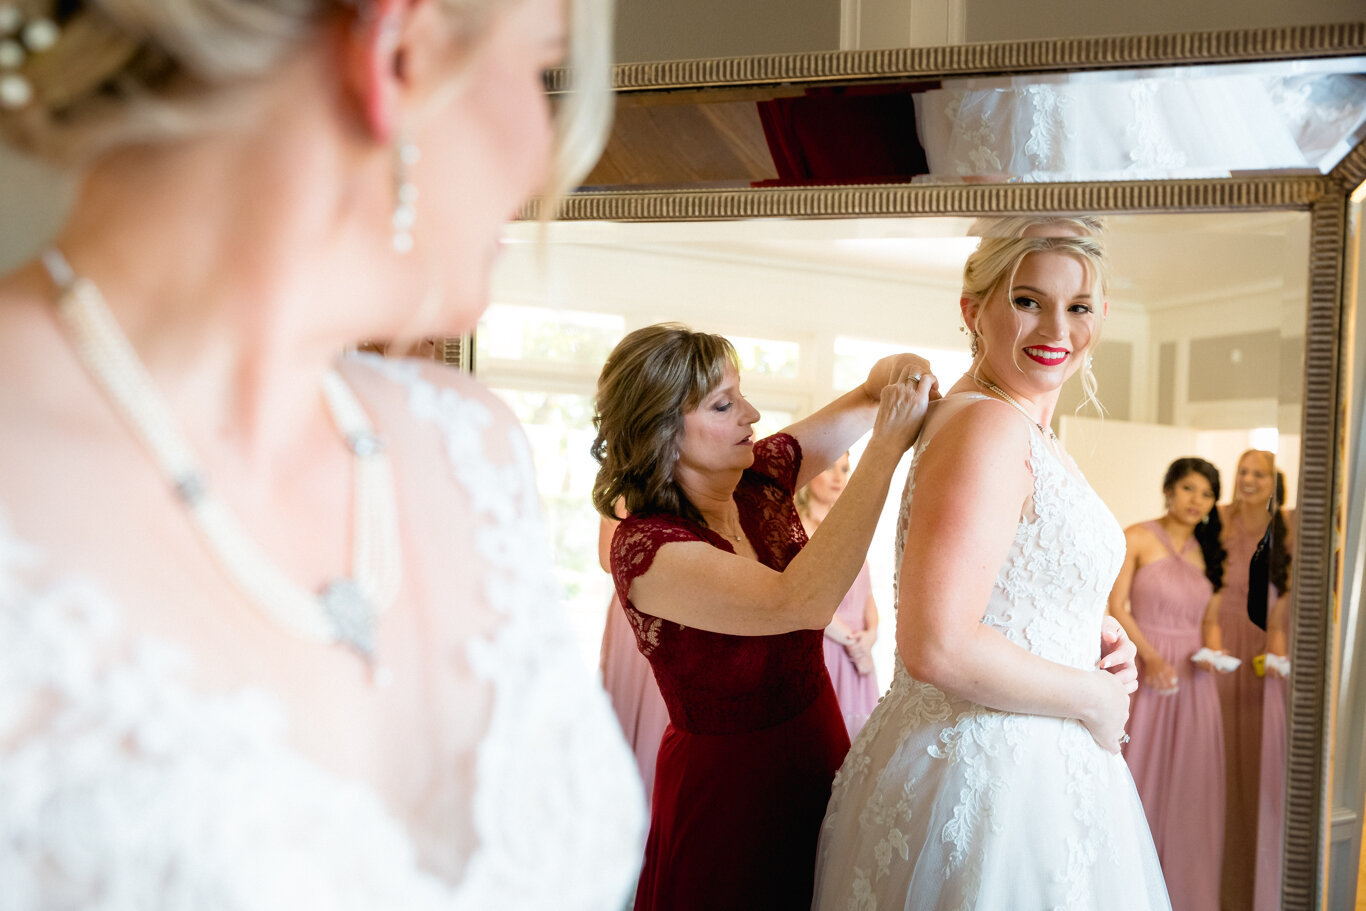 2019.08.24_Emily-Ashir-Wedding-at-the-Maples-5073.jpg